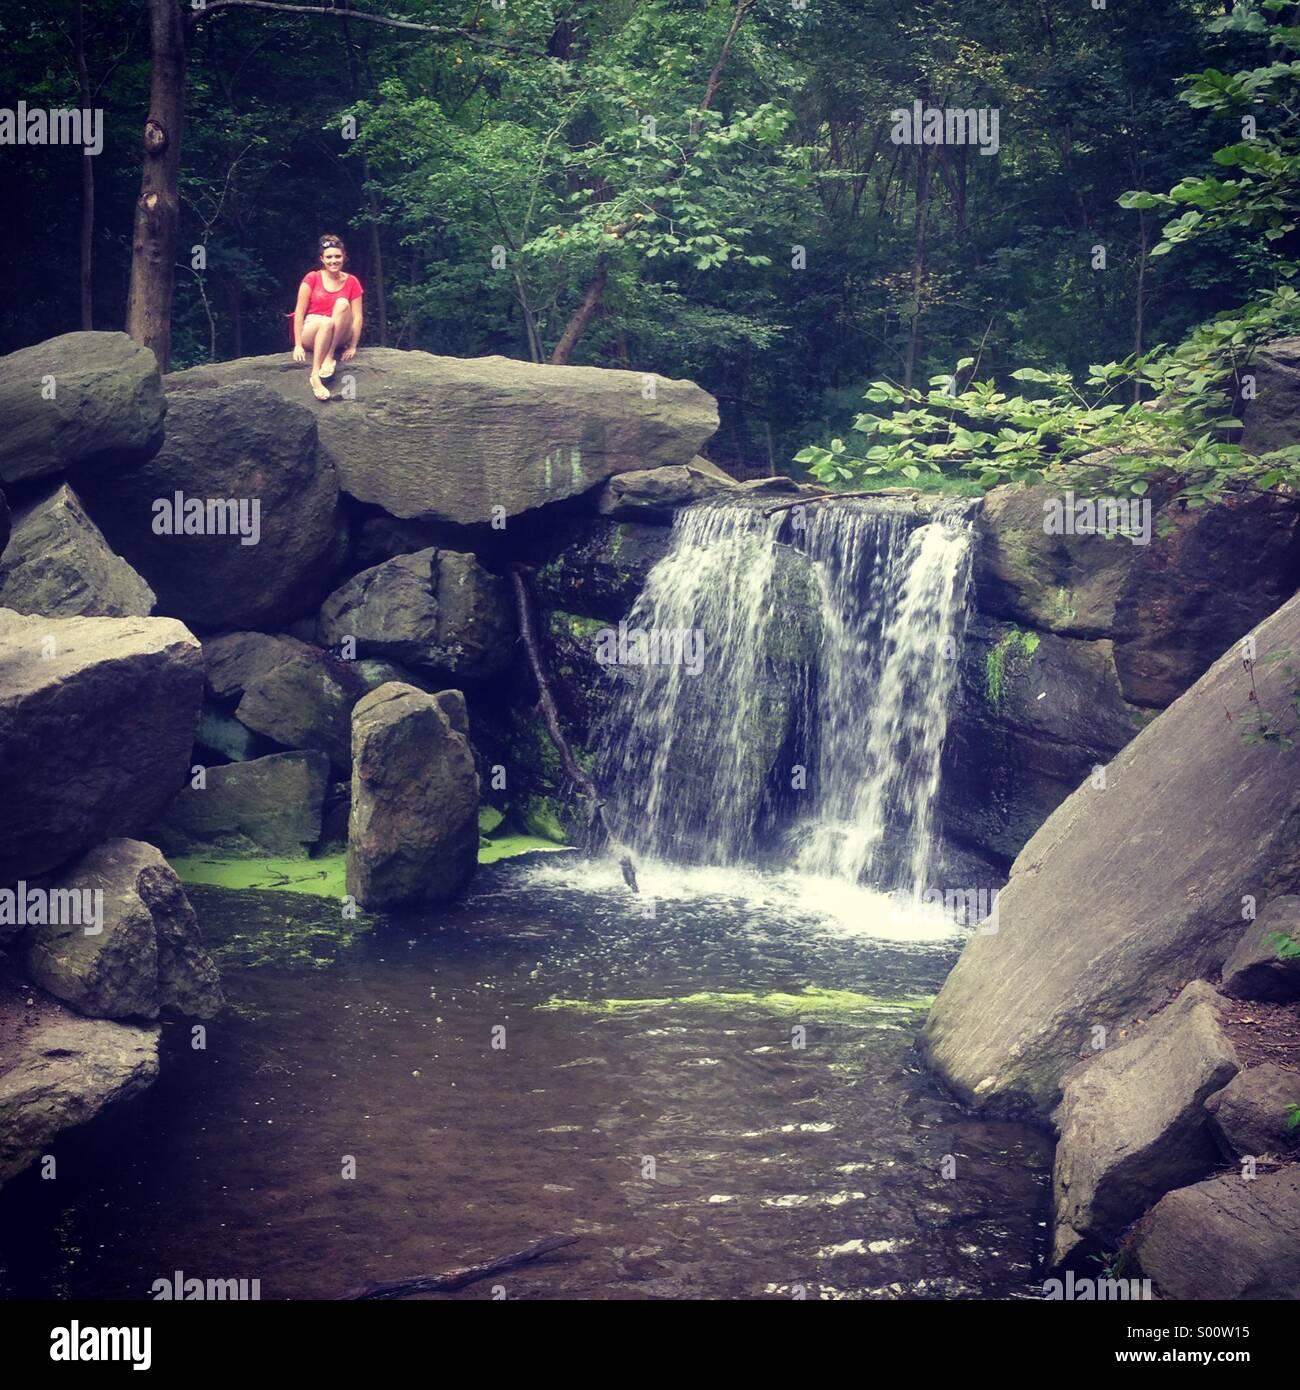 Central Park, man made rockery. New York - Stock Image